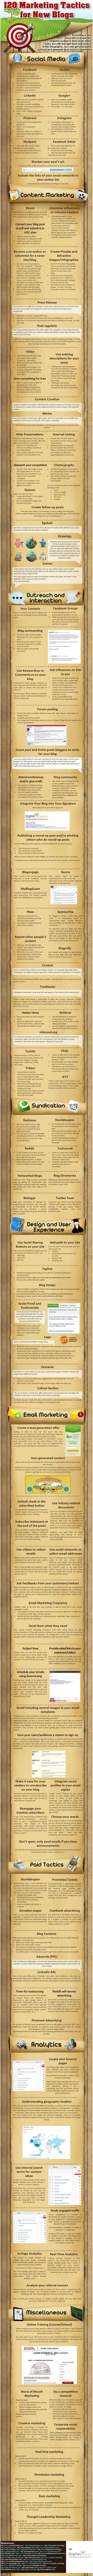 120 Marketing Tactics for New Blogs  Click to visit the original post